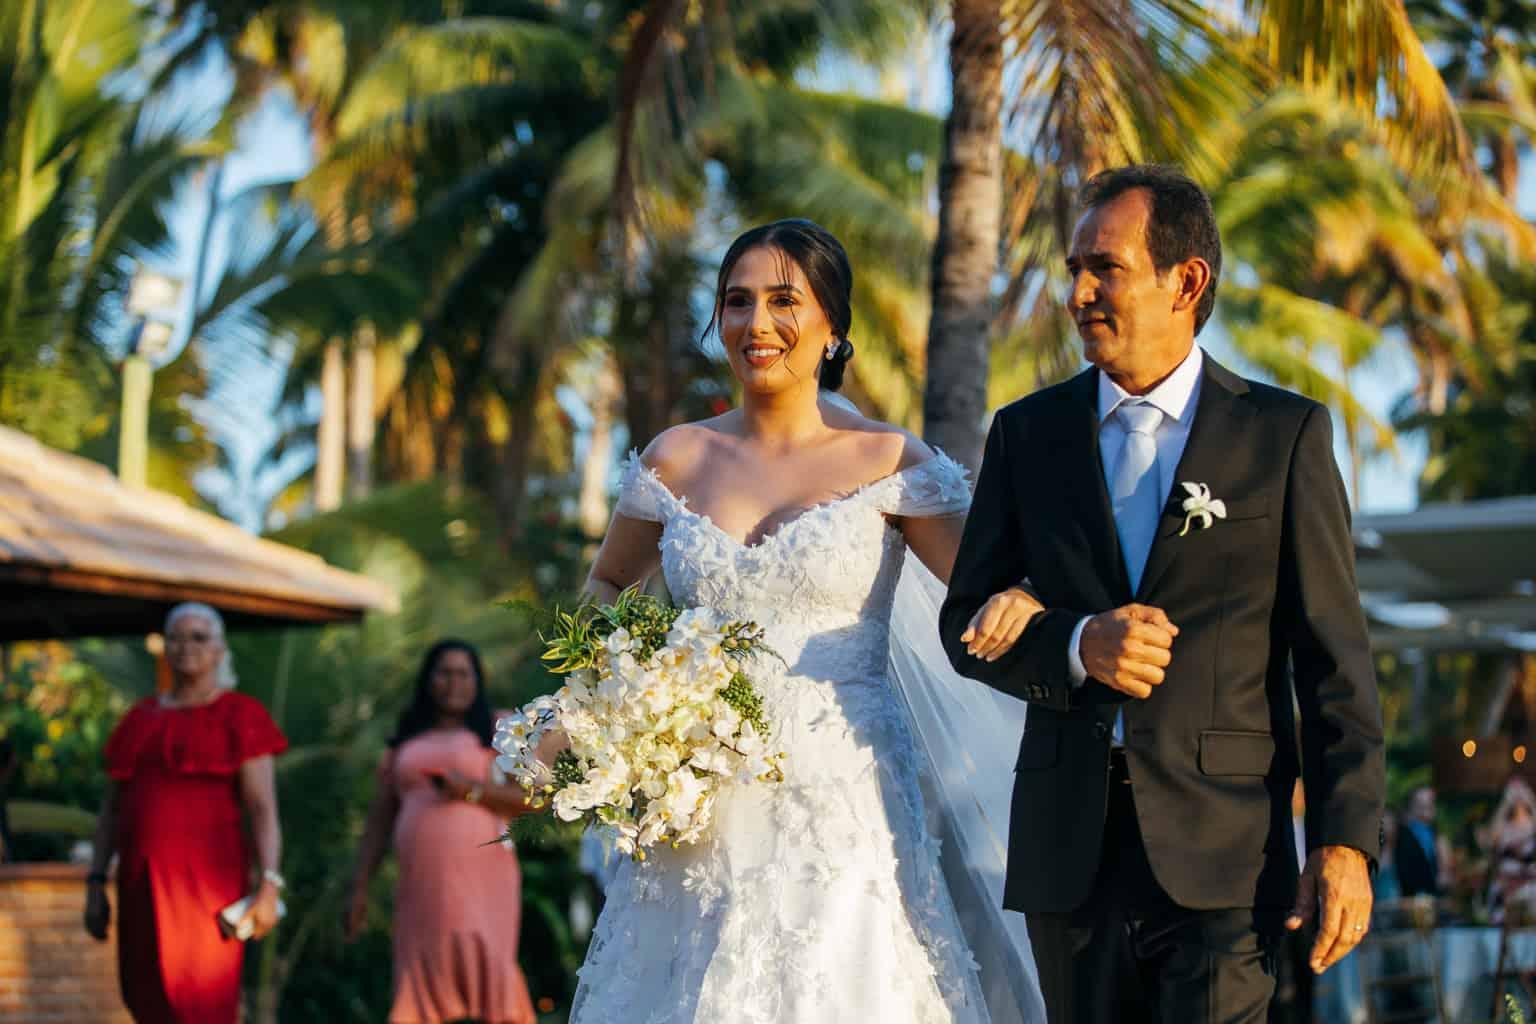 Casamento-Gardenia-e-Marcos-Antonio-Paulo-Bezerra-Joao-Curvelo-Carol-Maiorano-467-cerimonia